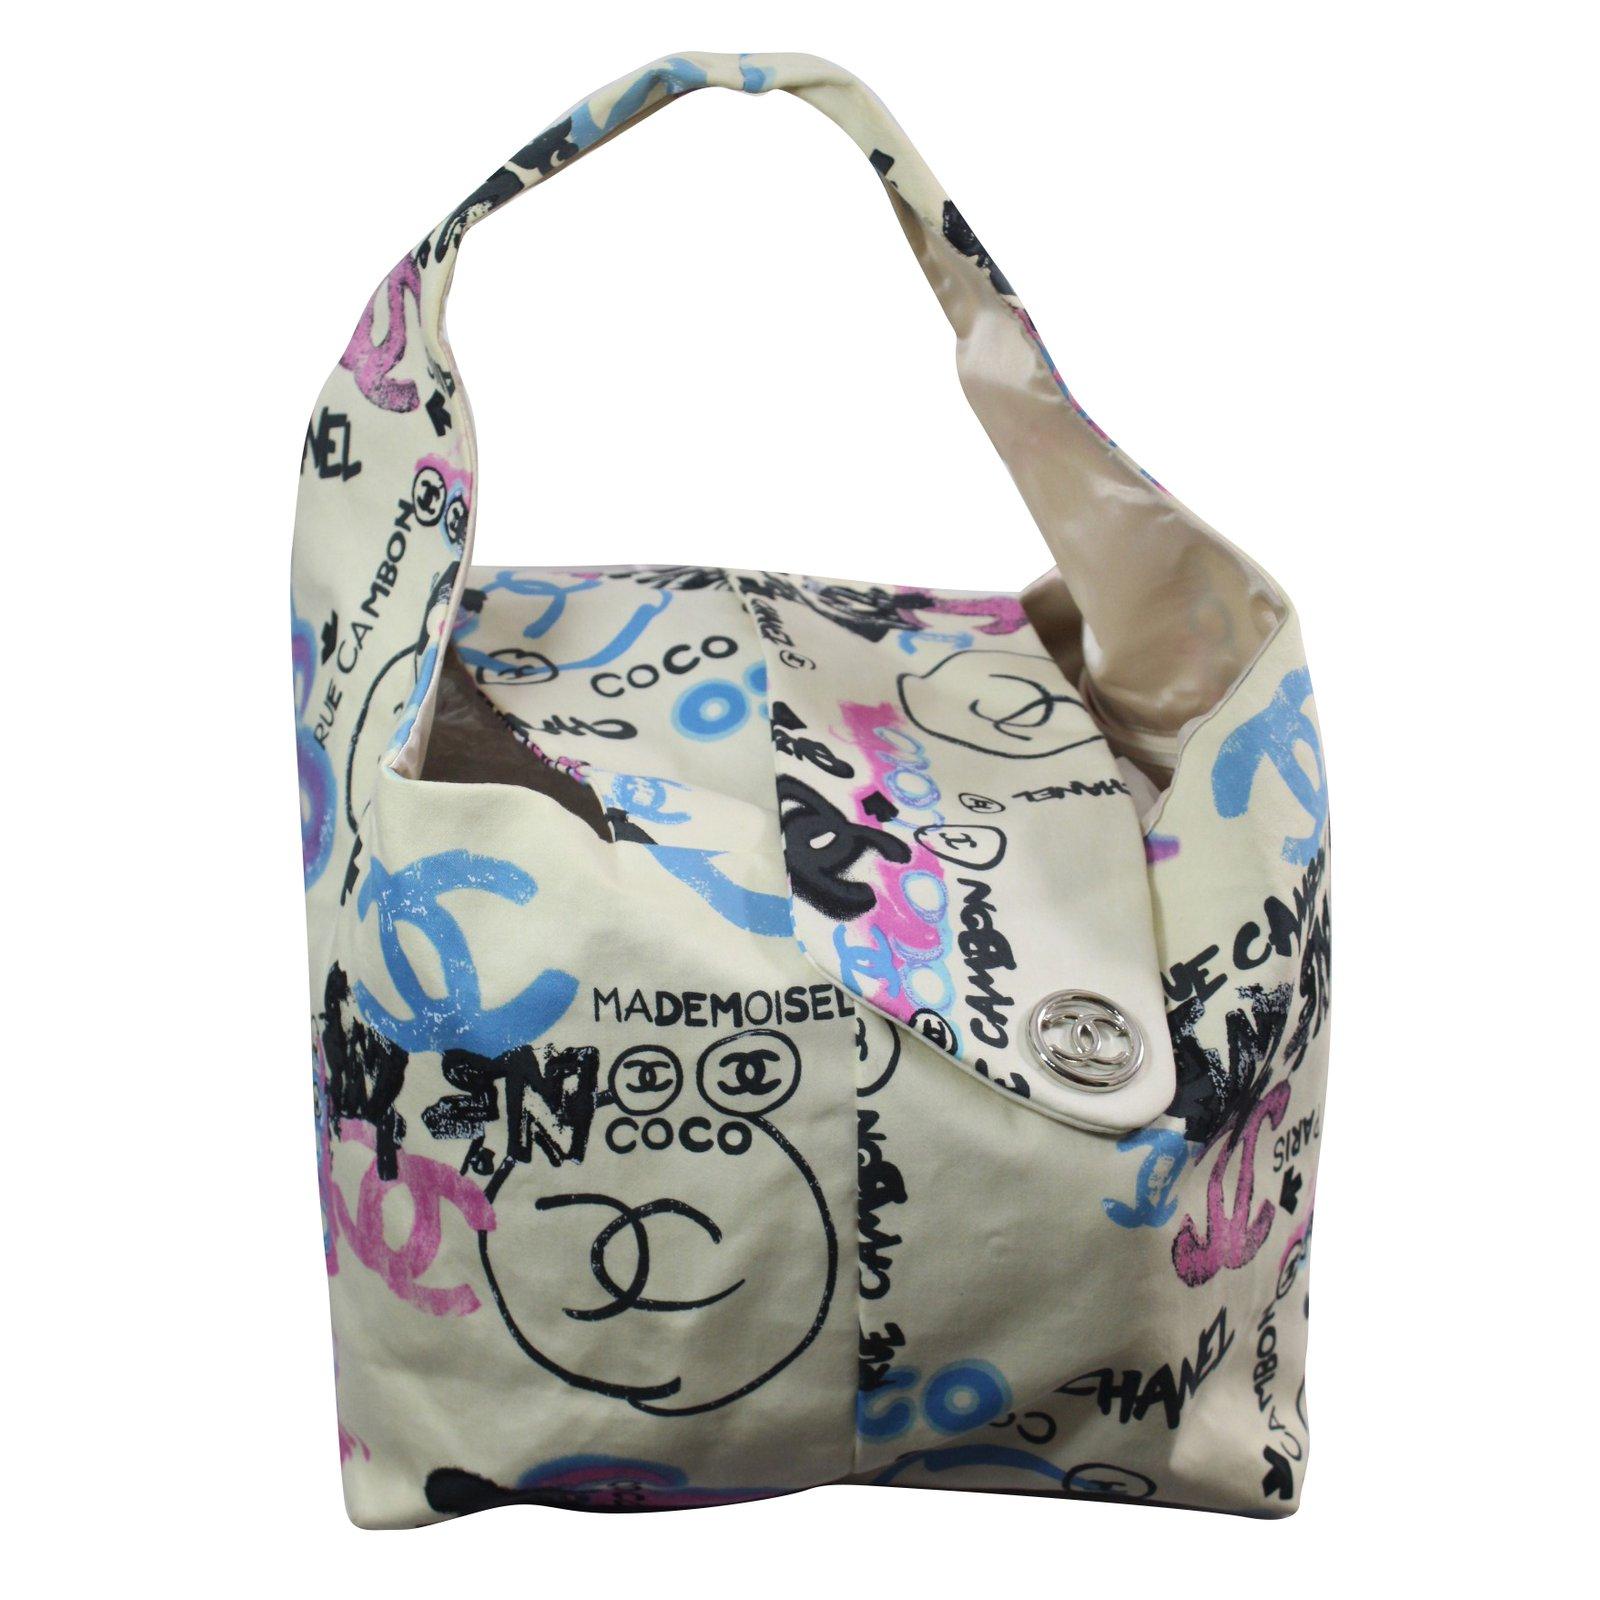 81a07a578e66 Chanel Handbag Handbags Cloth Beige ref.74773 - Joli Closet